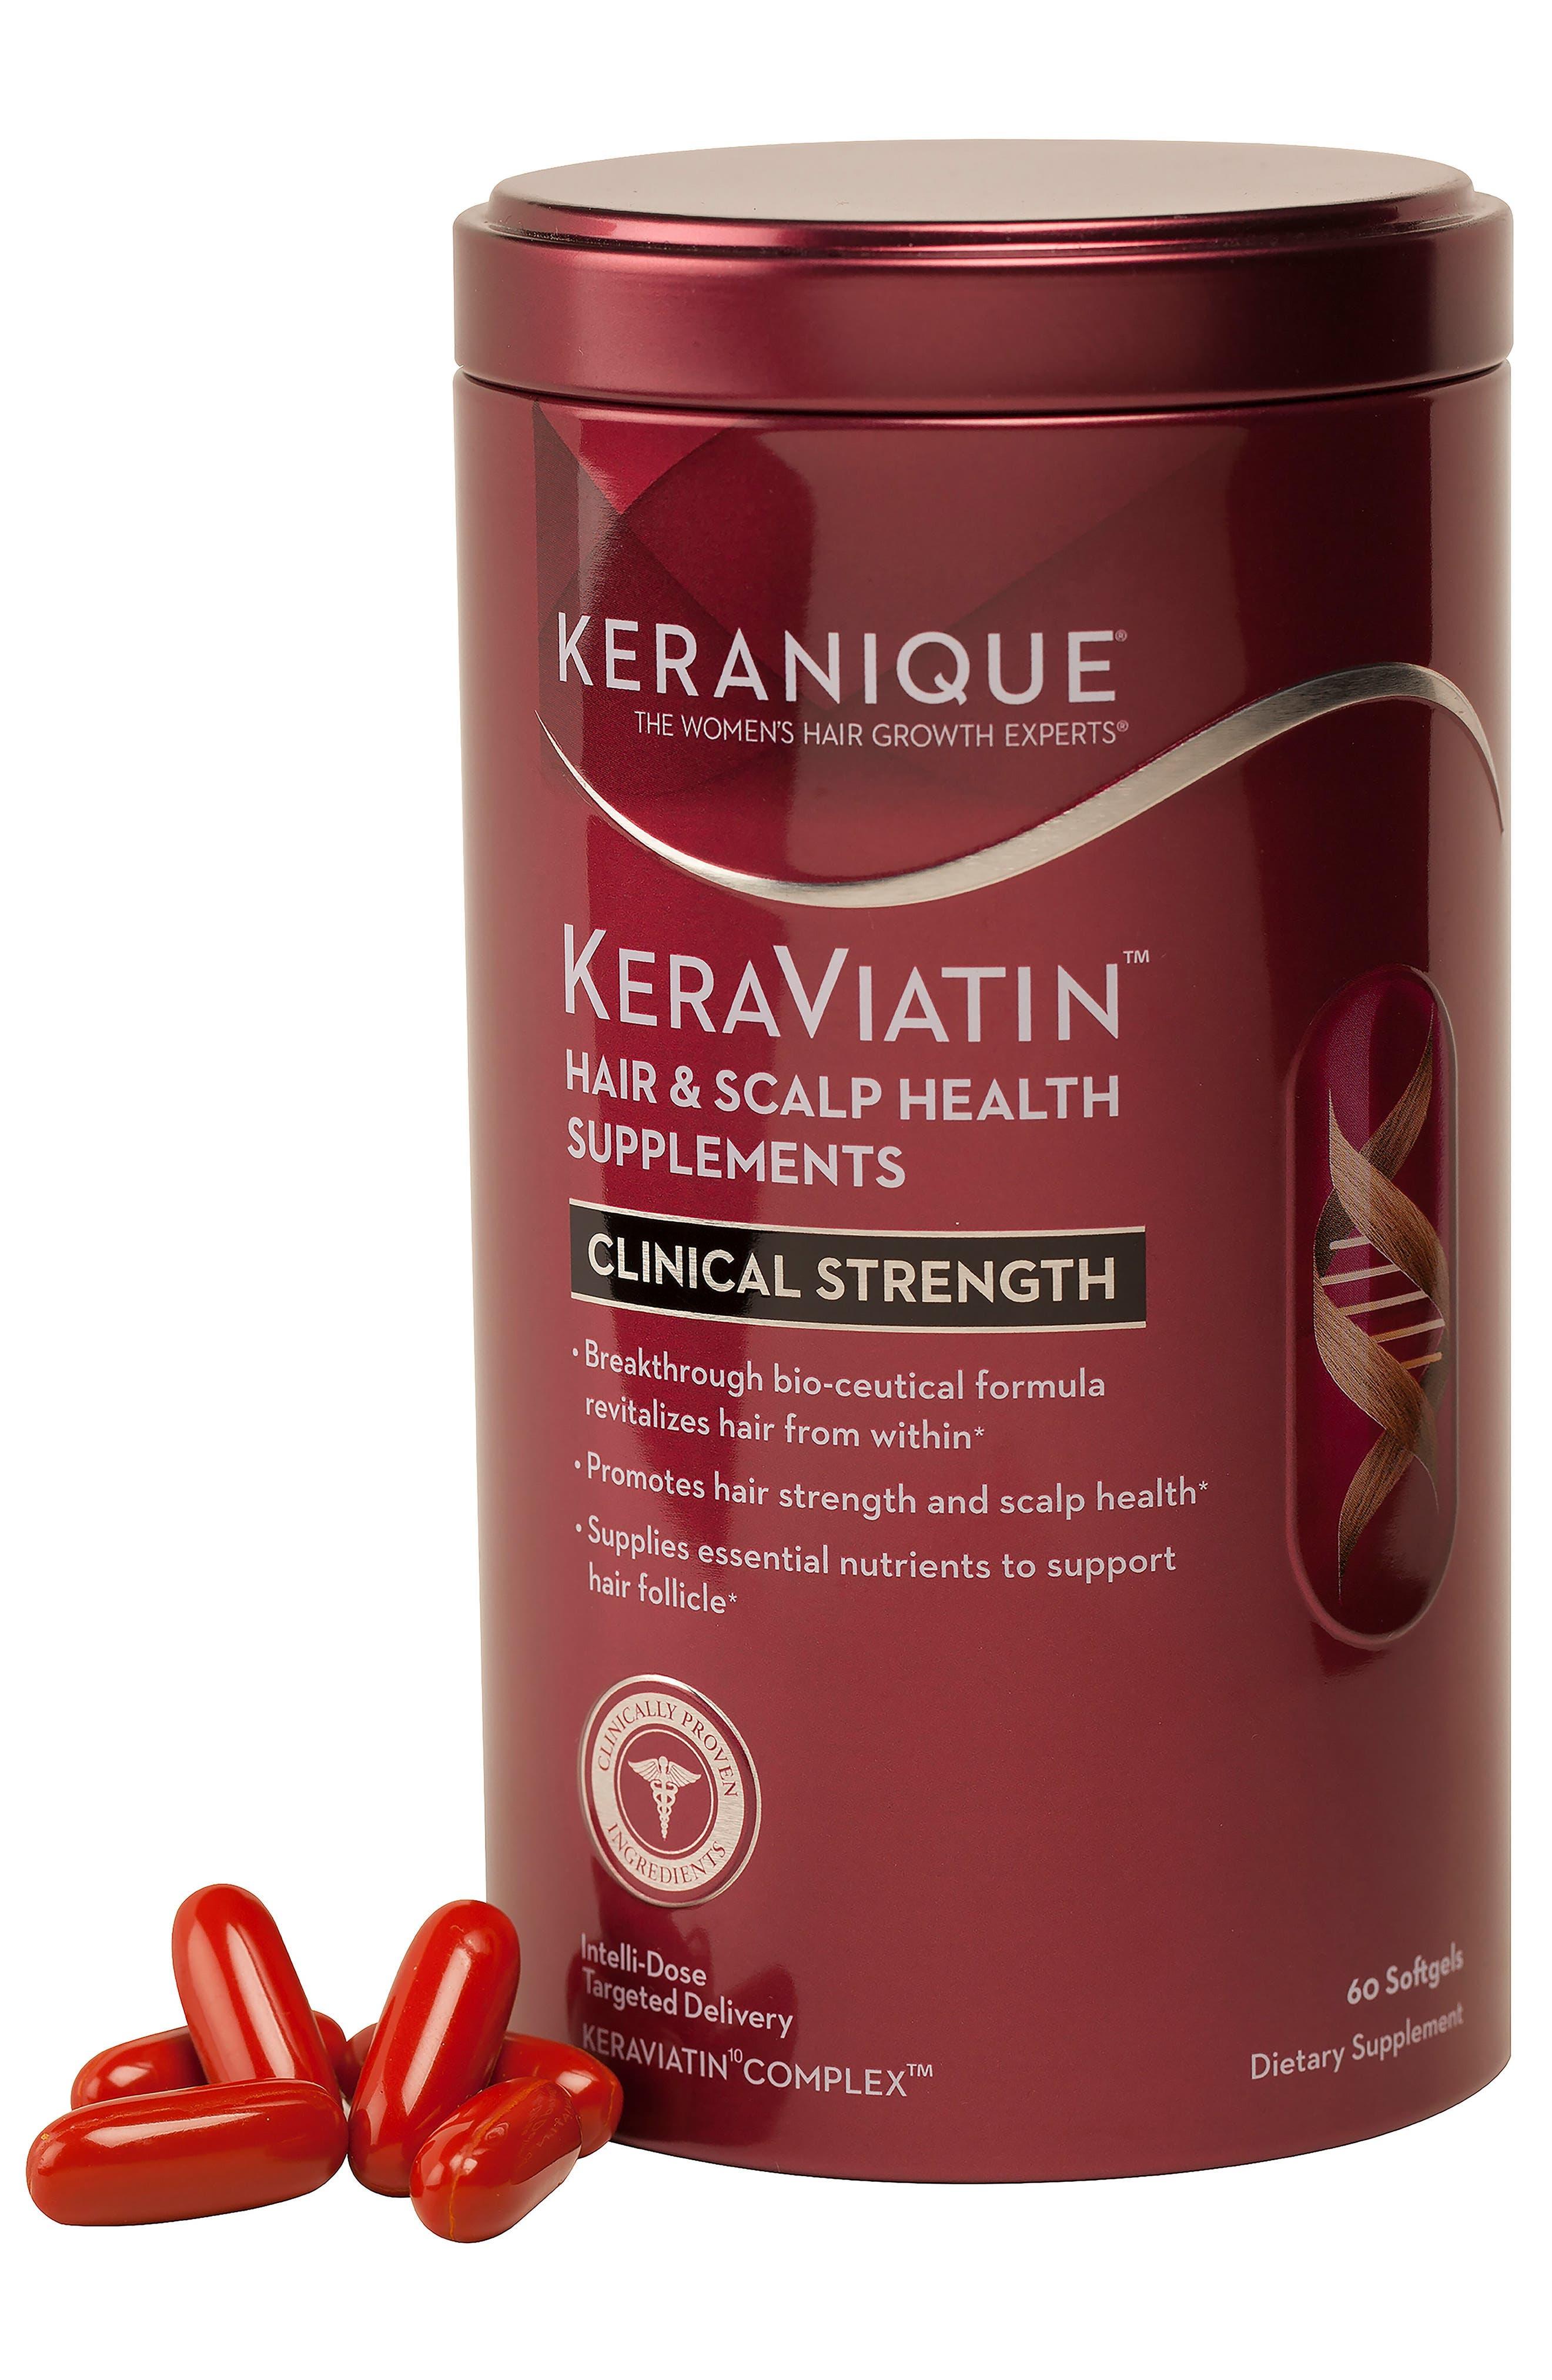 KeraViatin Hair & Scalp Health Supplements,                             Alternate thumbnail 2, color,                             NO COLOR